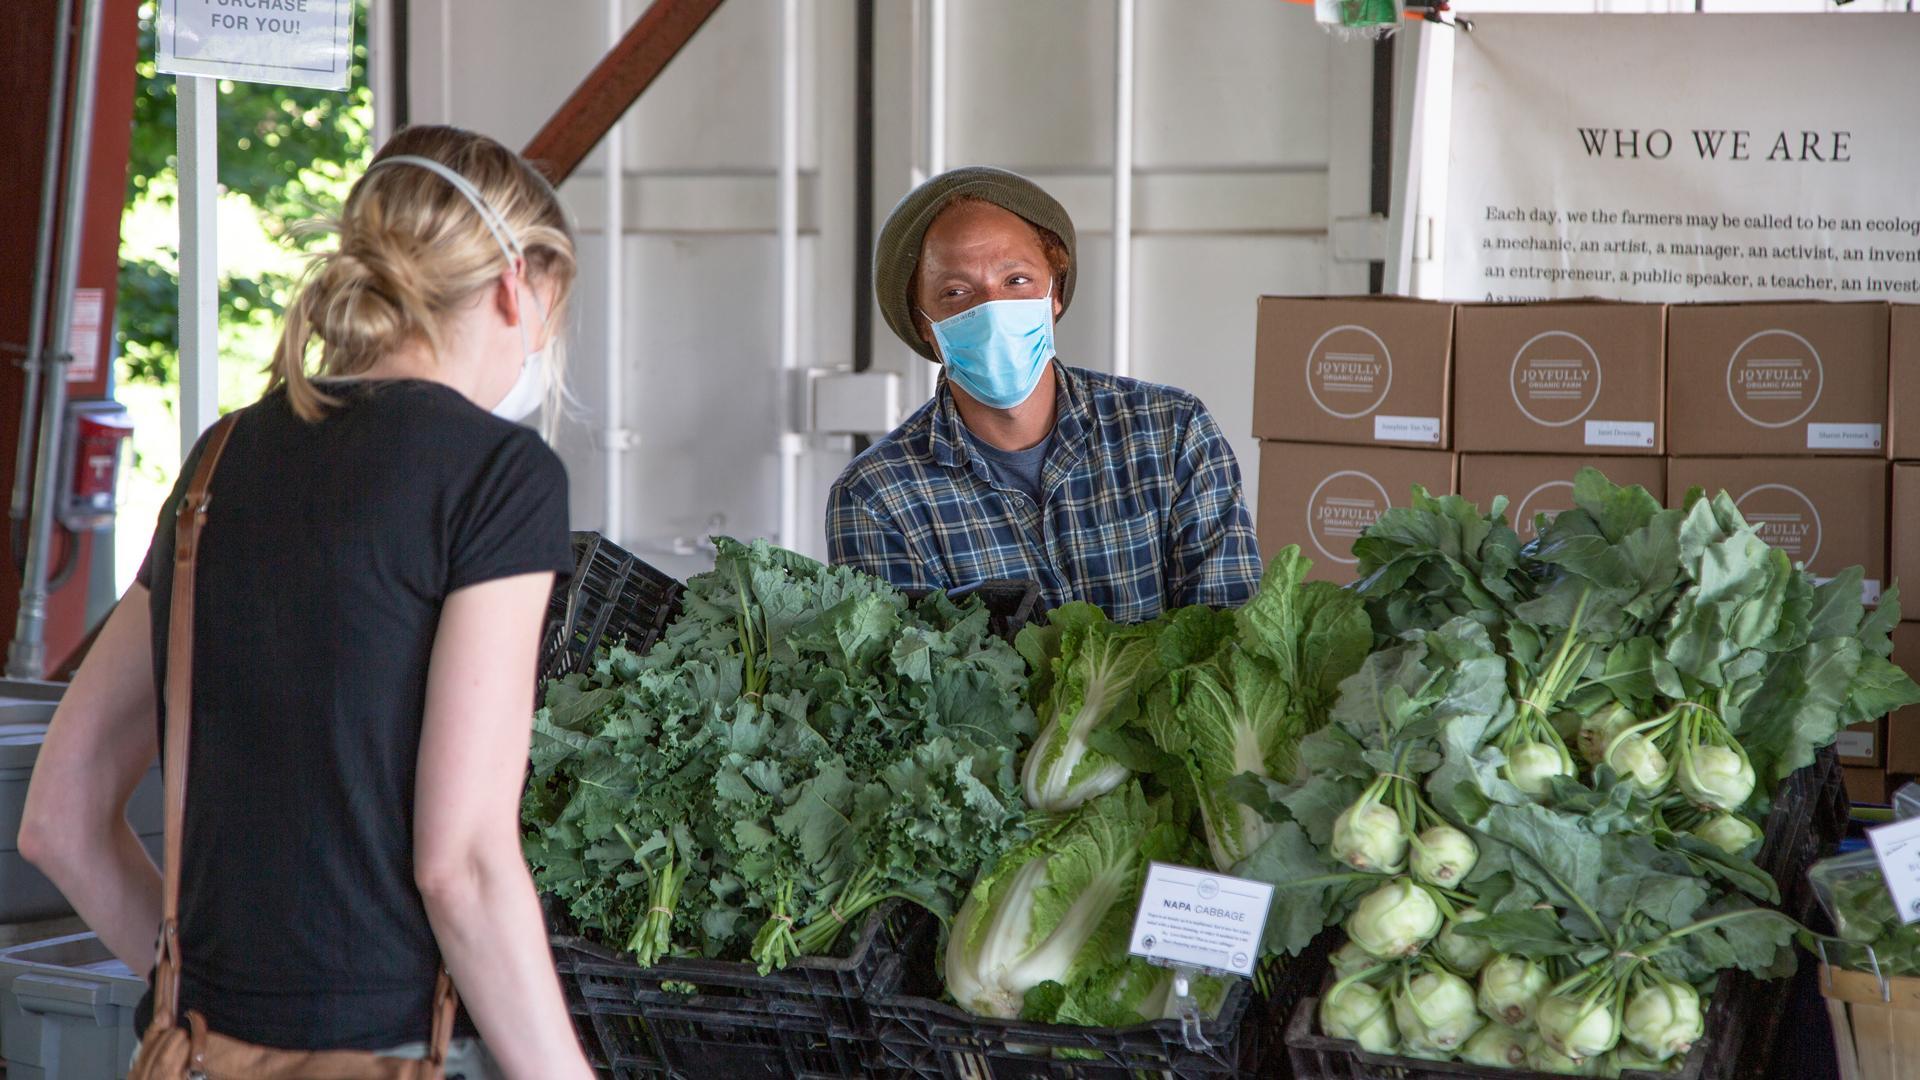 The freshest farmers' markets in Toronto | Fresh lettuce at the Brickworks Farmers' Market